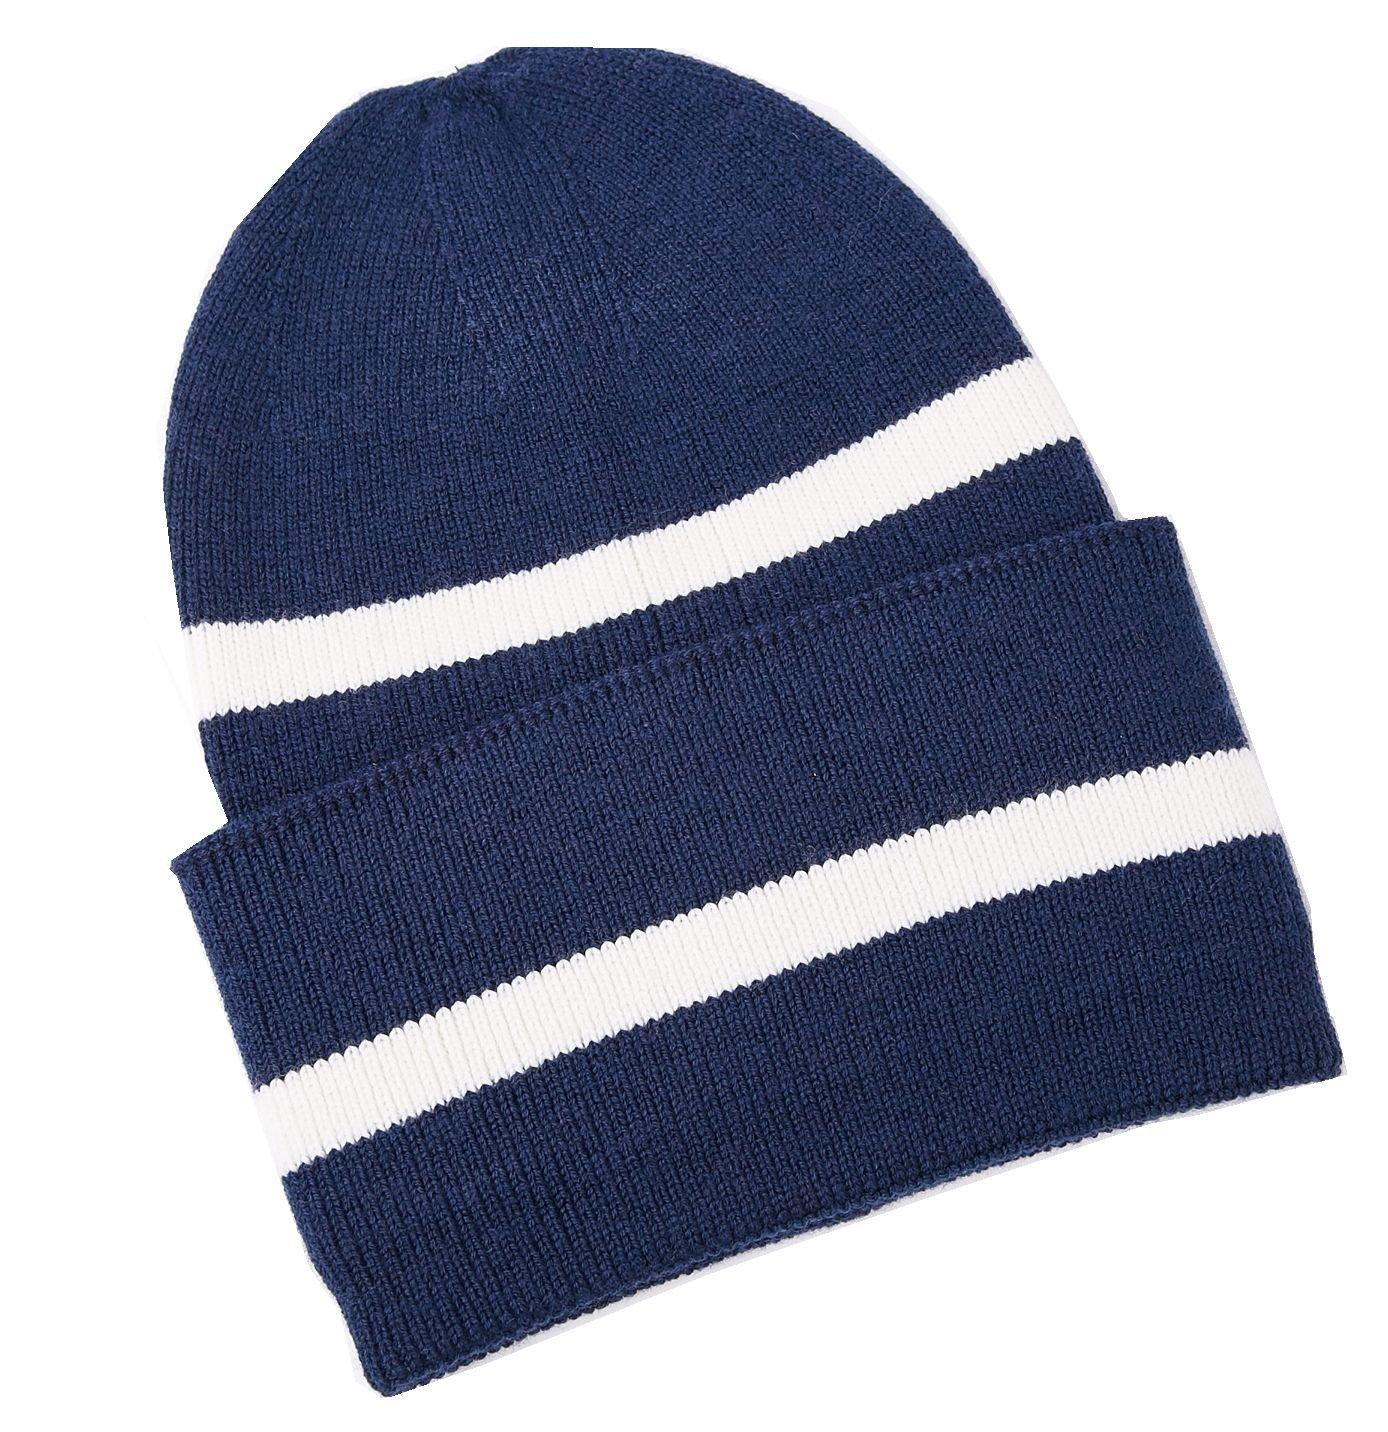 KUMONE Men Beanie Hat - Winter Cashmere Knitting Skull Cap, Navy